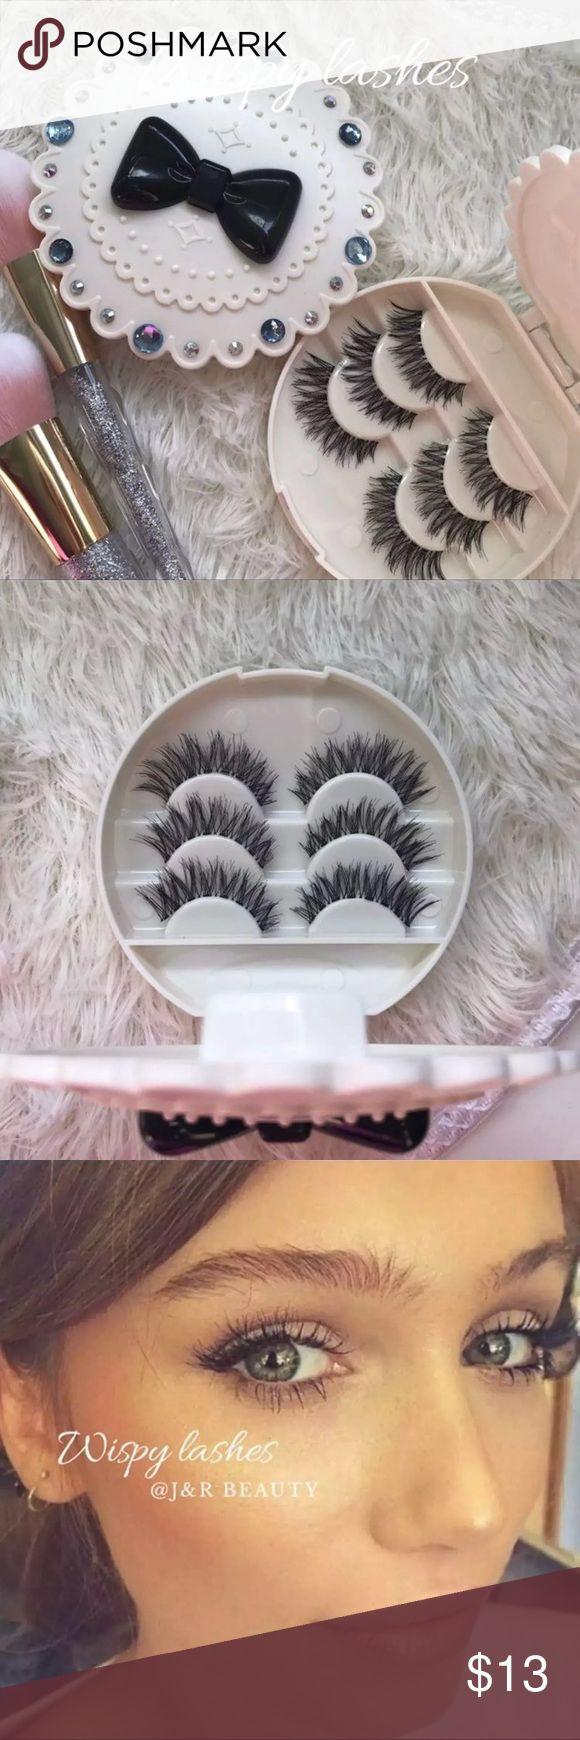 Cinderella Eyelash Case + 3WSP Lashes All brand new include ✨3 kinds of Wispy eyelashes  ✨Eyelash Case   +$2 Add on eyelash Applicator  +$3 Add on eyelash glue Please message me if you want to add them.    # tags Iconic, mink, red cherry eyelashes, house of lashes, doll, kawaii, case, full, natural,  Koko, Ardell, wispies, Demi , makeup,   Ship within 24 hours ❣️ Makeup False Eyelashes